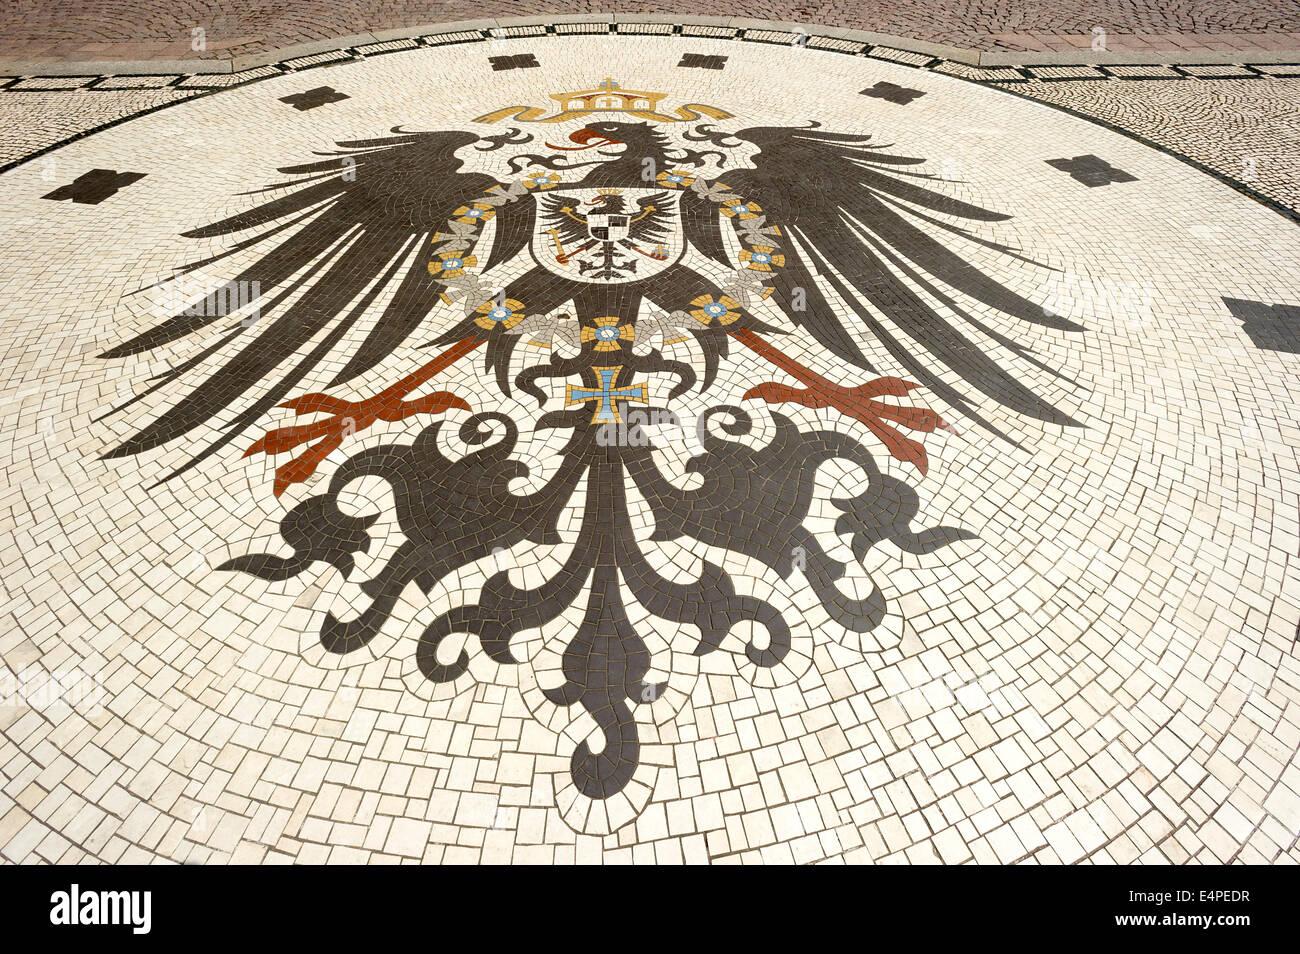 coat arms german imperial eagle stock photos u0026 coat arms german